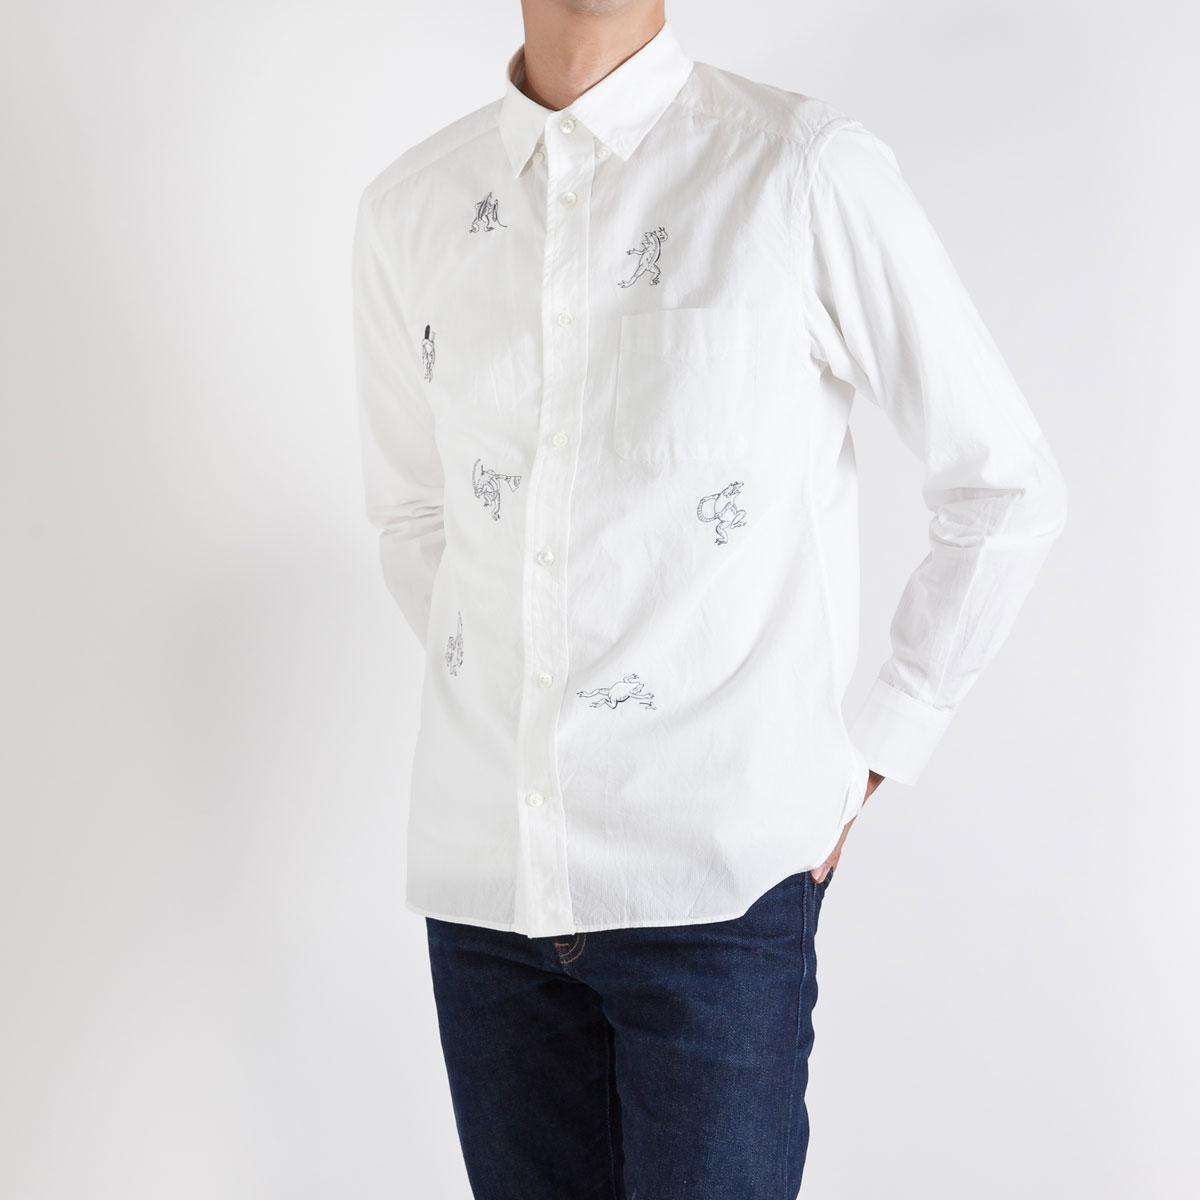 KY19-680M/メンズシャツ[播州織]/蛙